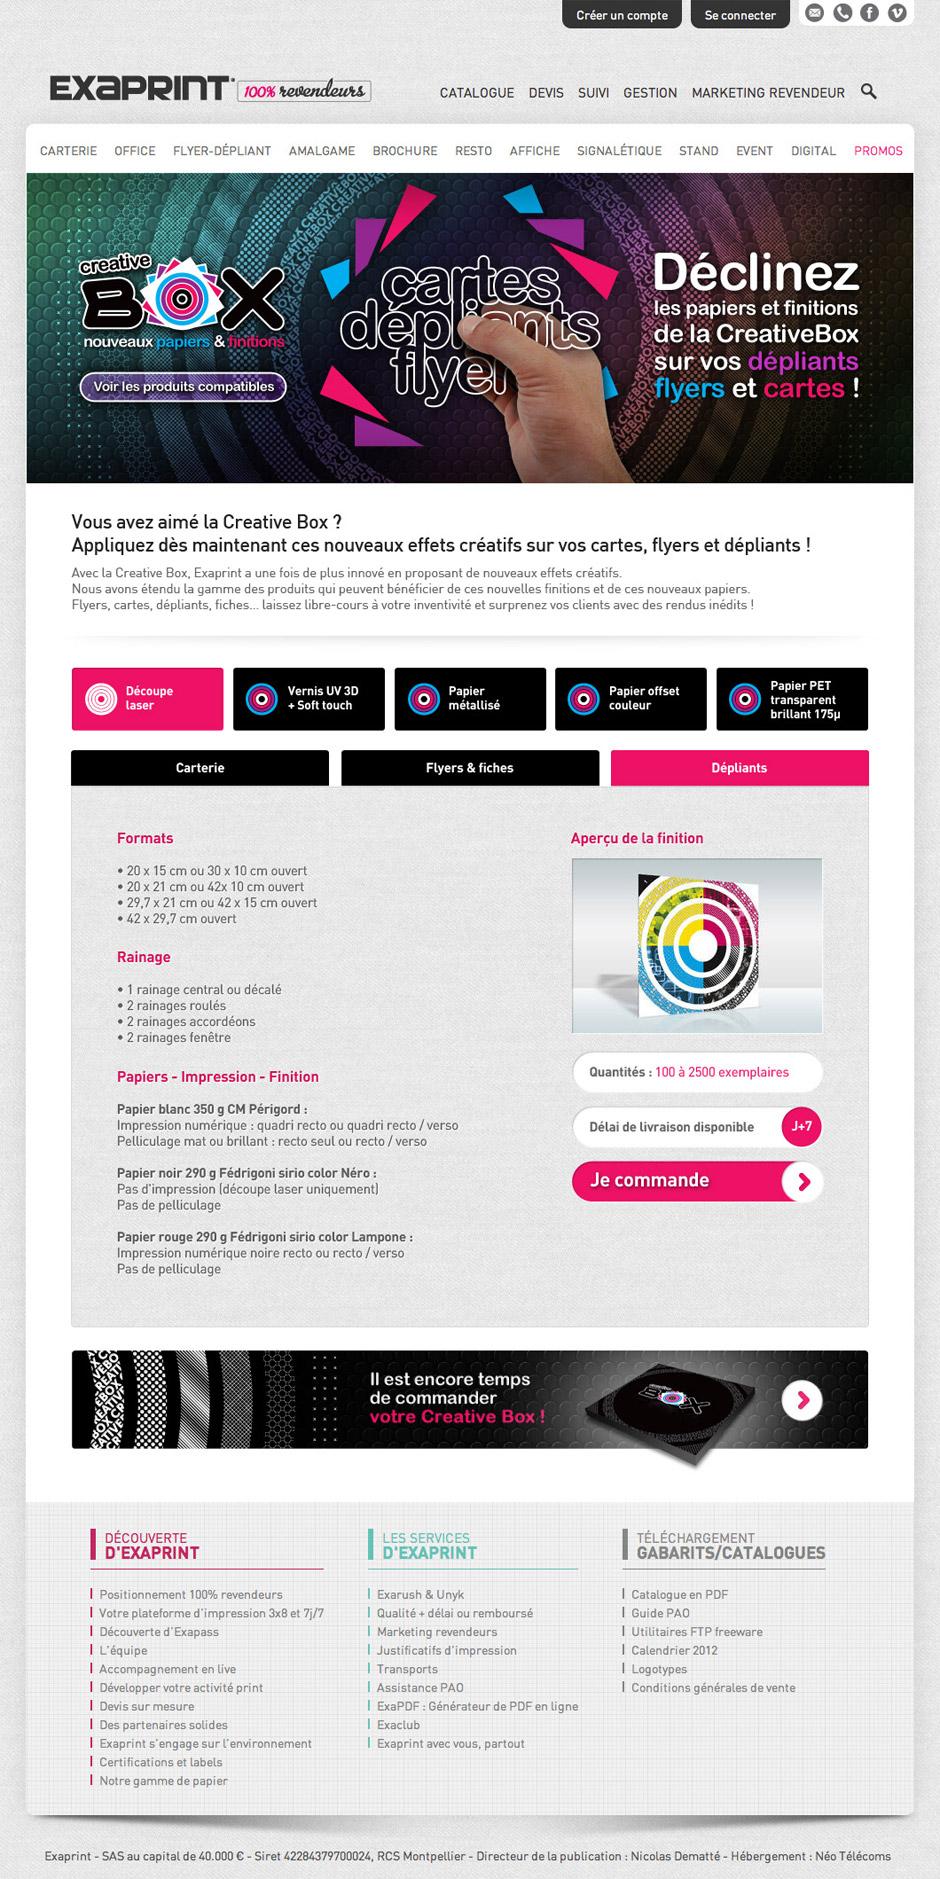 graphiste-montpellier-creation-exaprint-creativebox-agence-communication-montpellier-caconcept-alexis-cretin-6